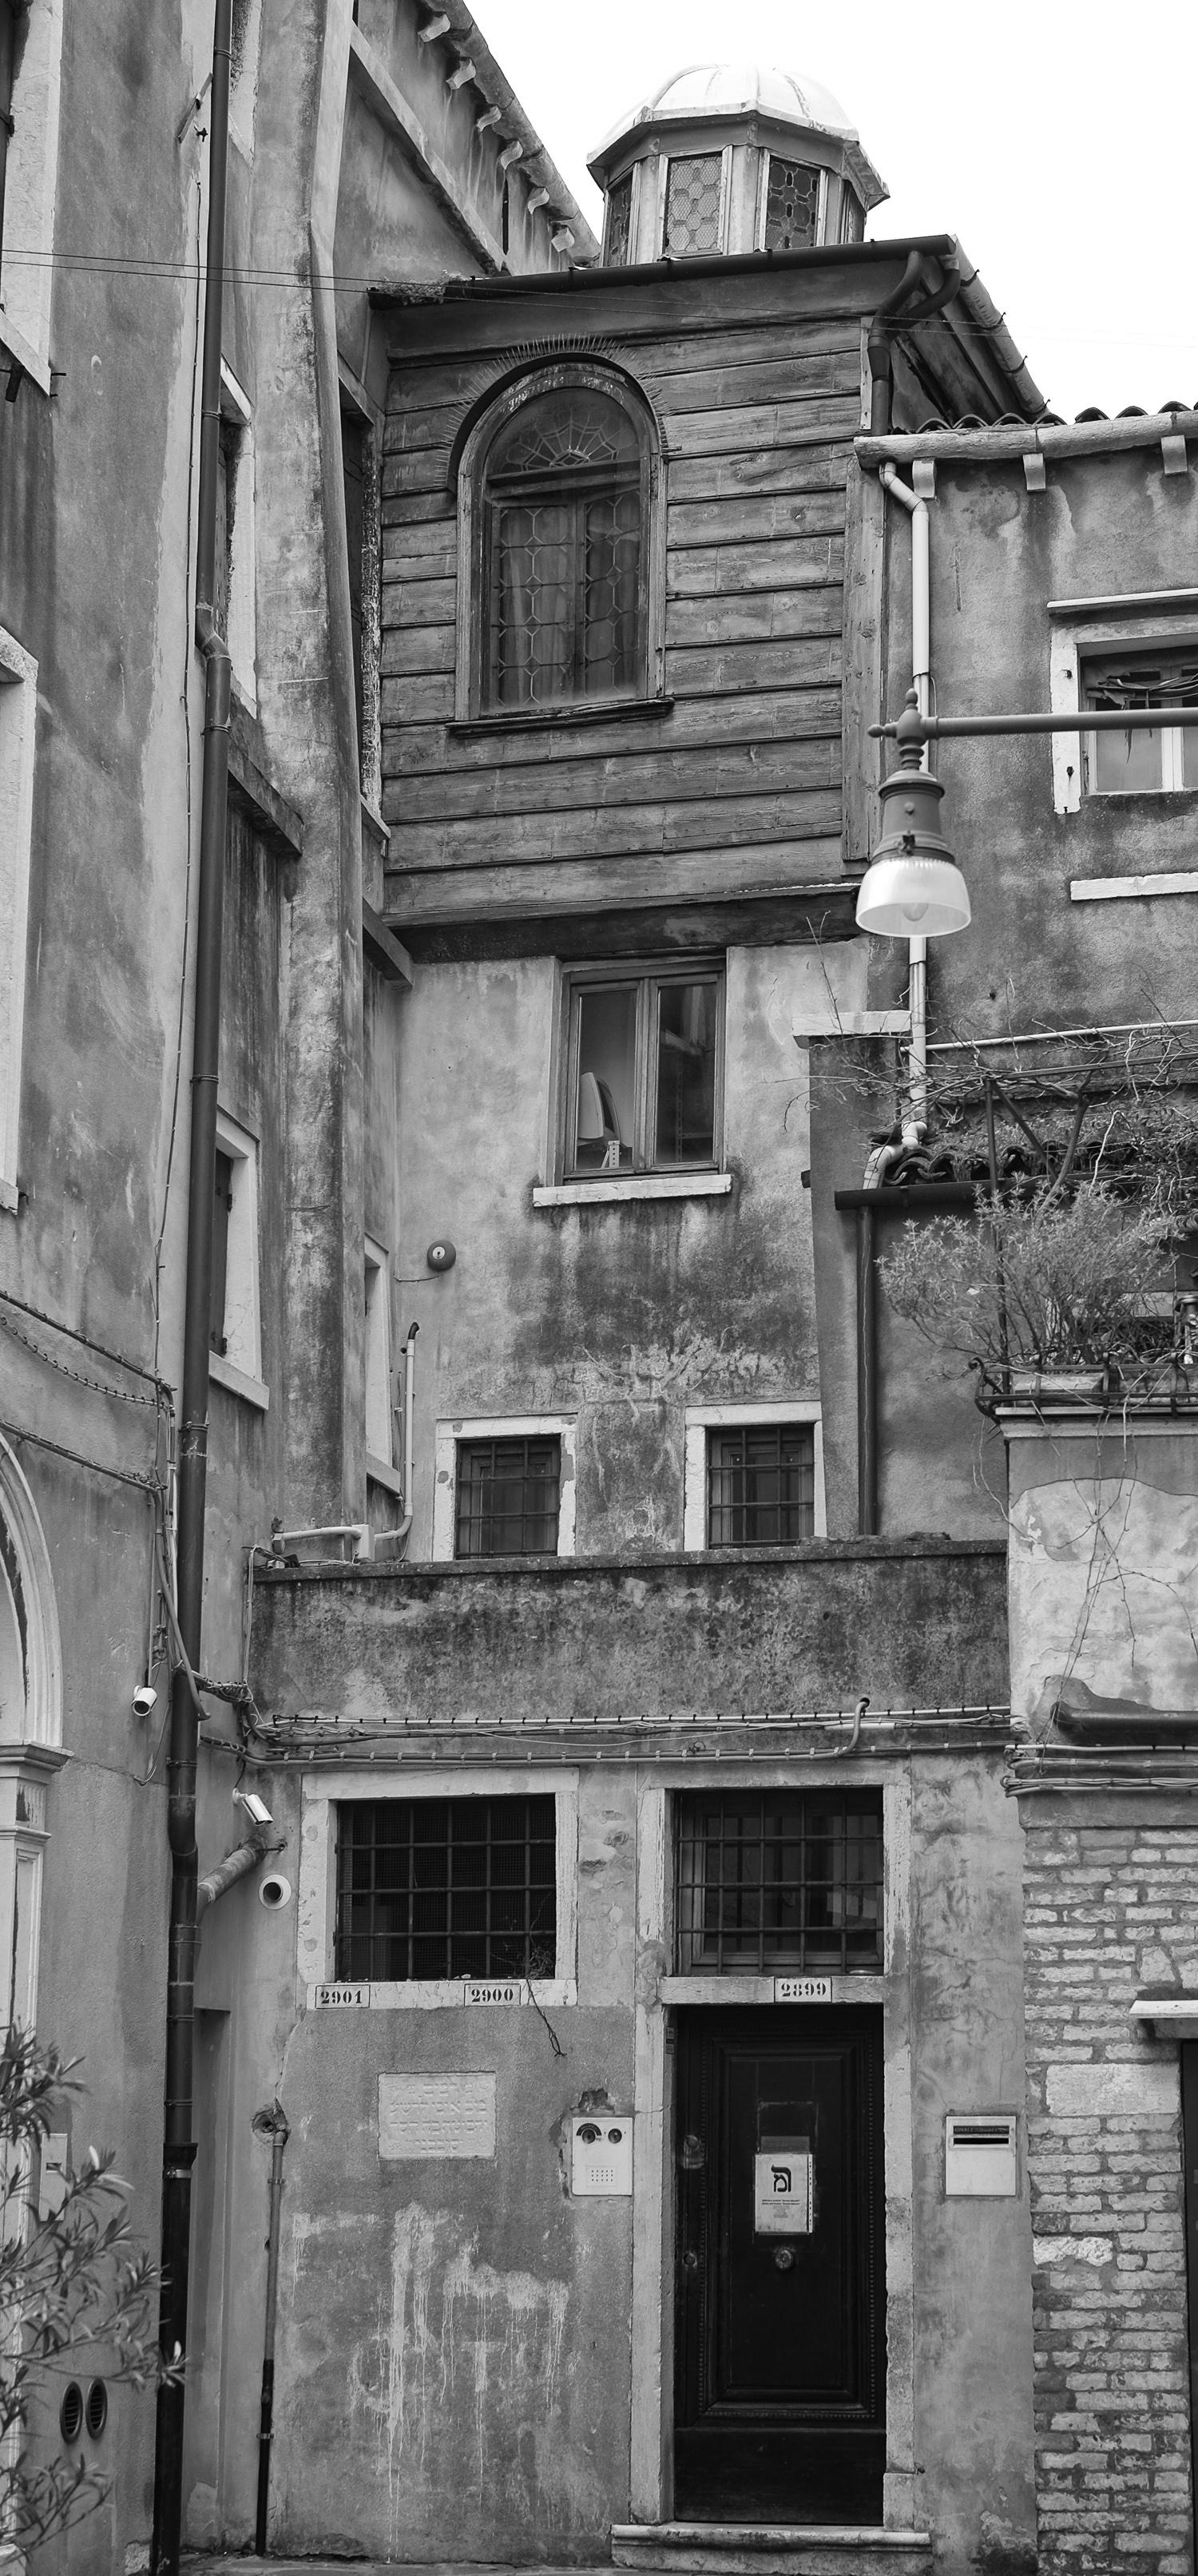 20130222 - Venice (1500) -19.jpg